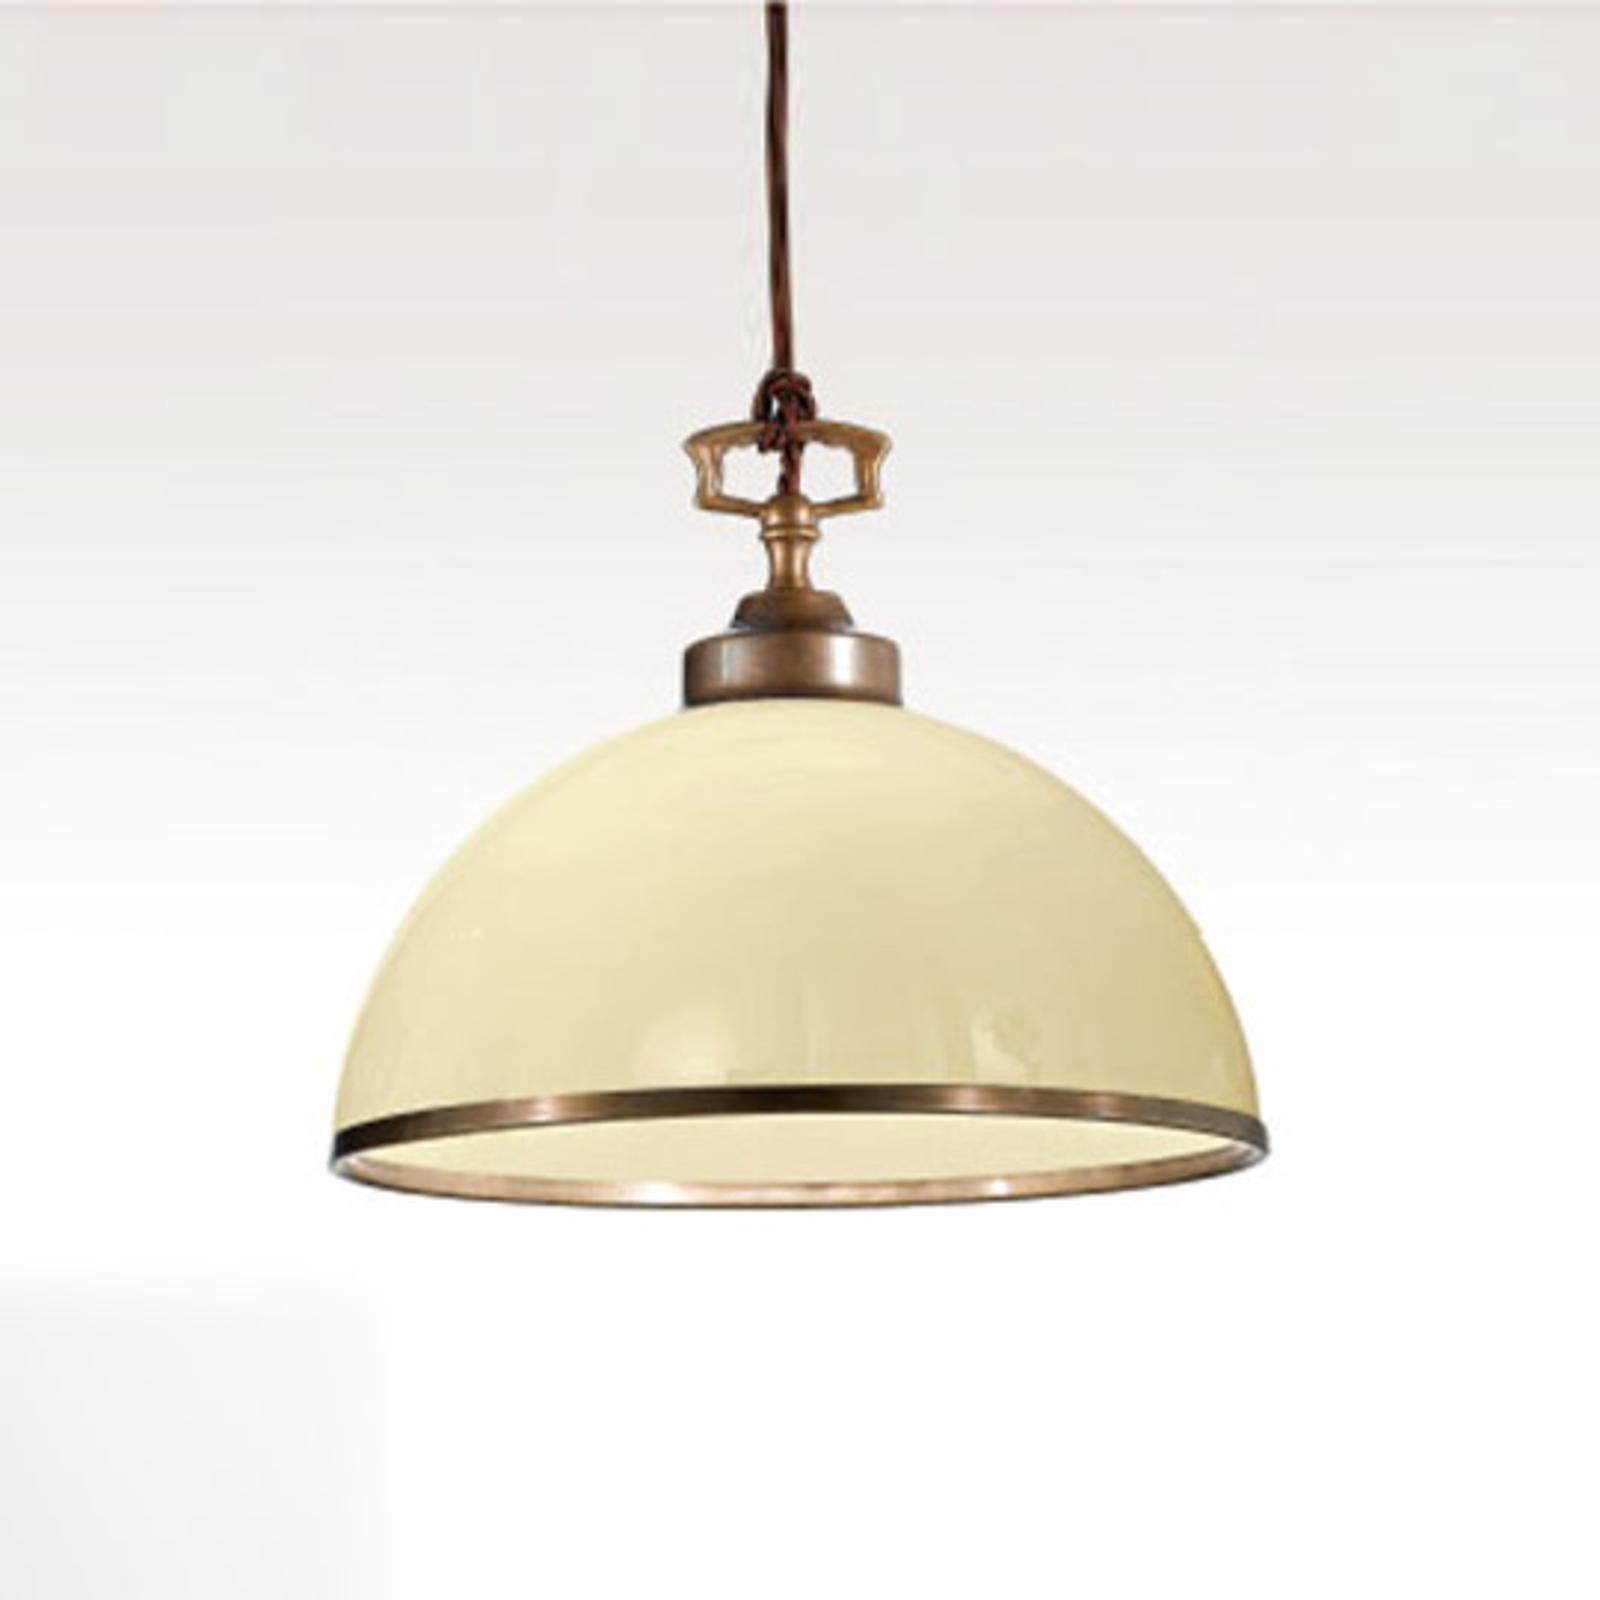 Lámpara colgante La Botte, marfil